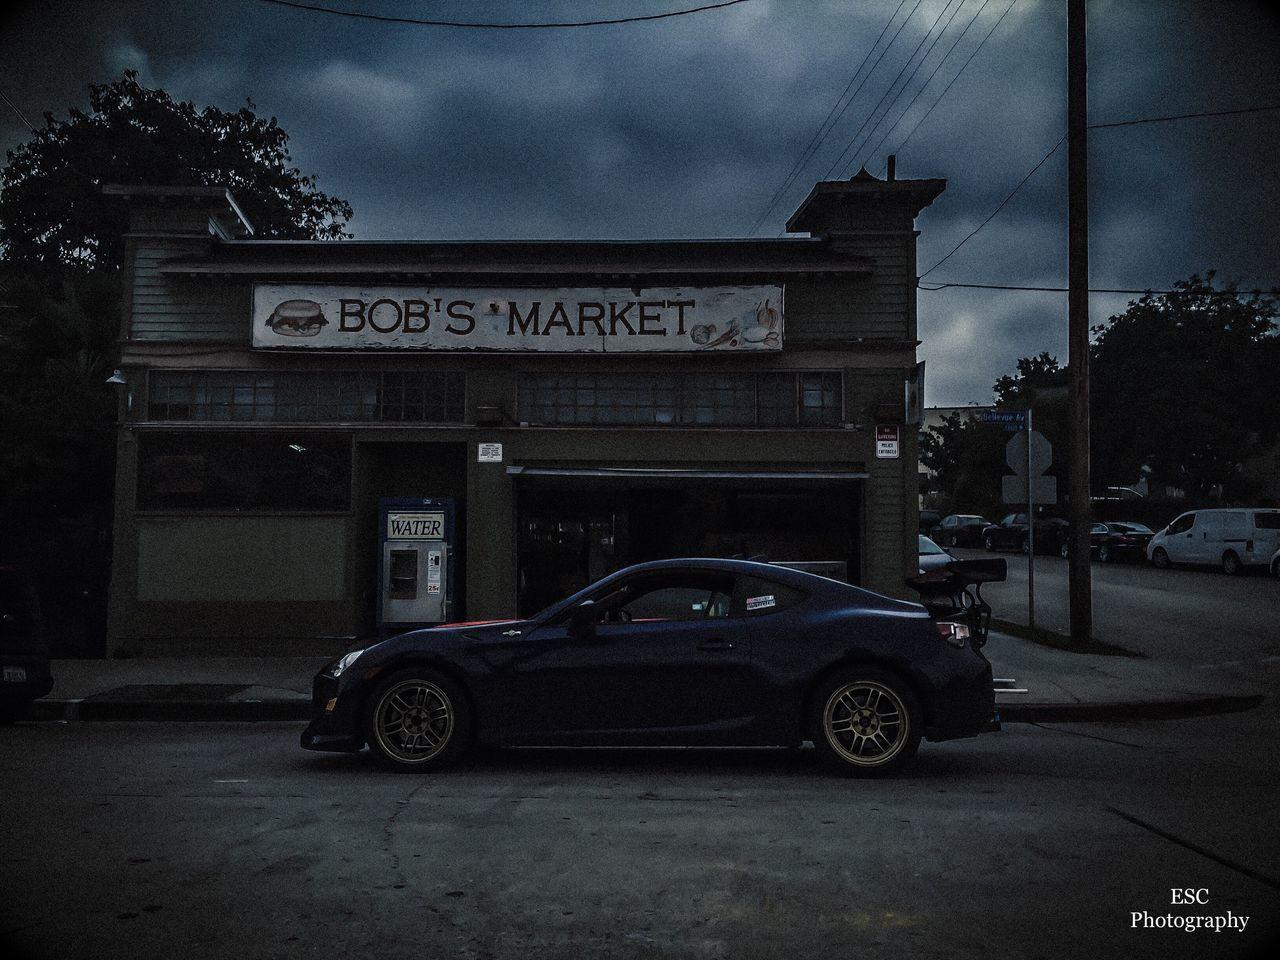 Bobs Market | Toretto's Market | Car Street Outdoors Car Photography Fastandfurious Historical Landmarks History Subaru Scion  FRS Brz MOVIE Built Structure Architecture Photography Photographer Losangeles